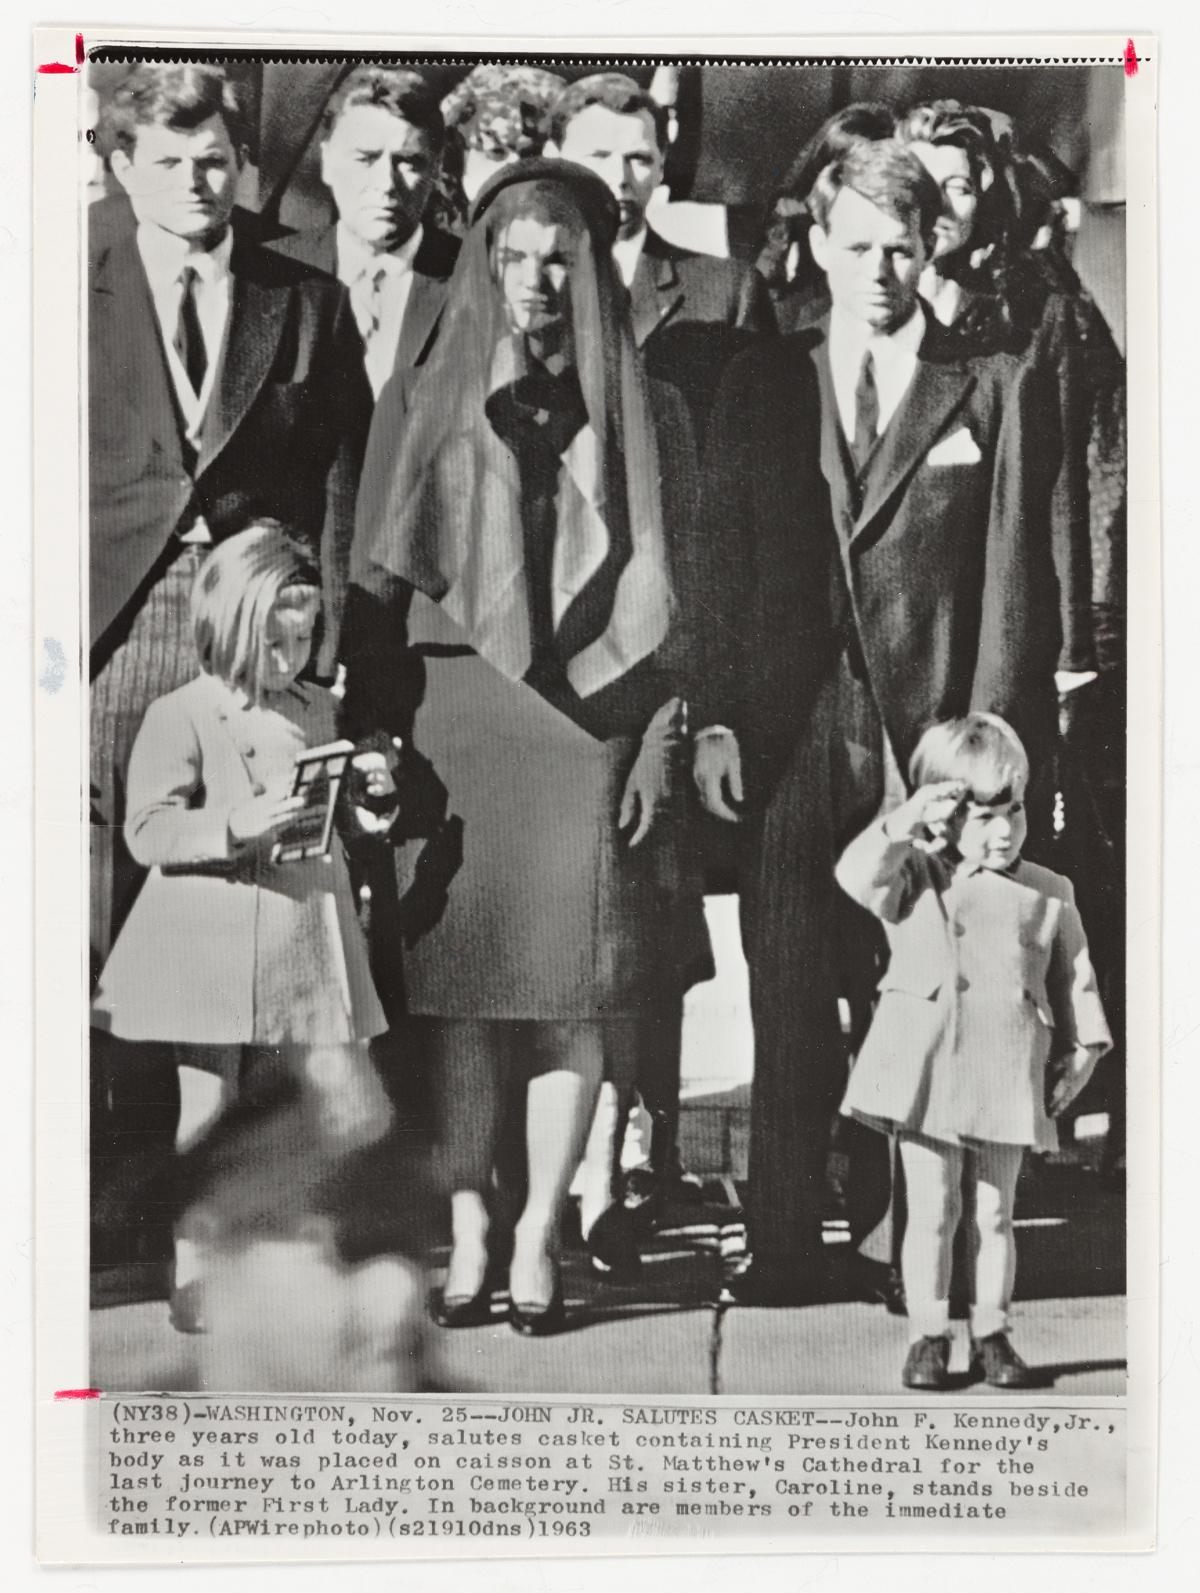 DAN FARRELL (1930-2015) John F. Kennedy, Jr. salutes his fathers casket.